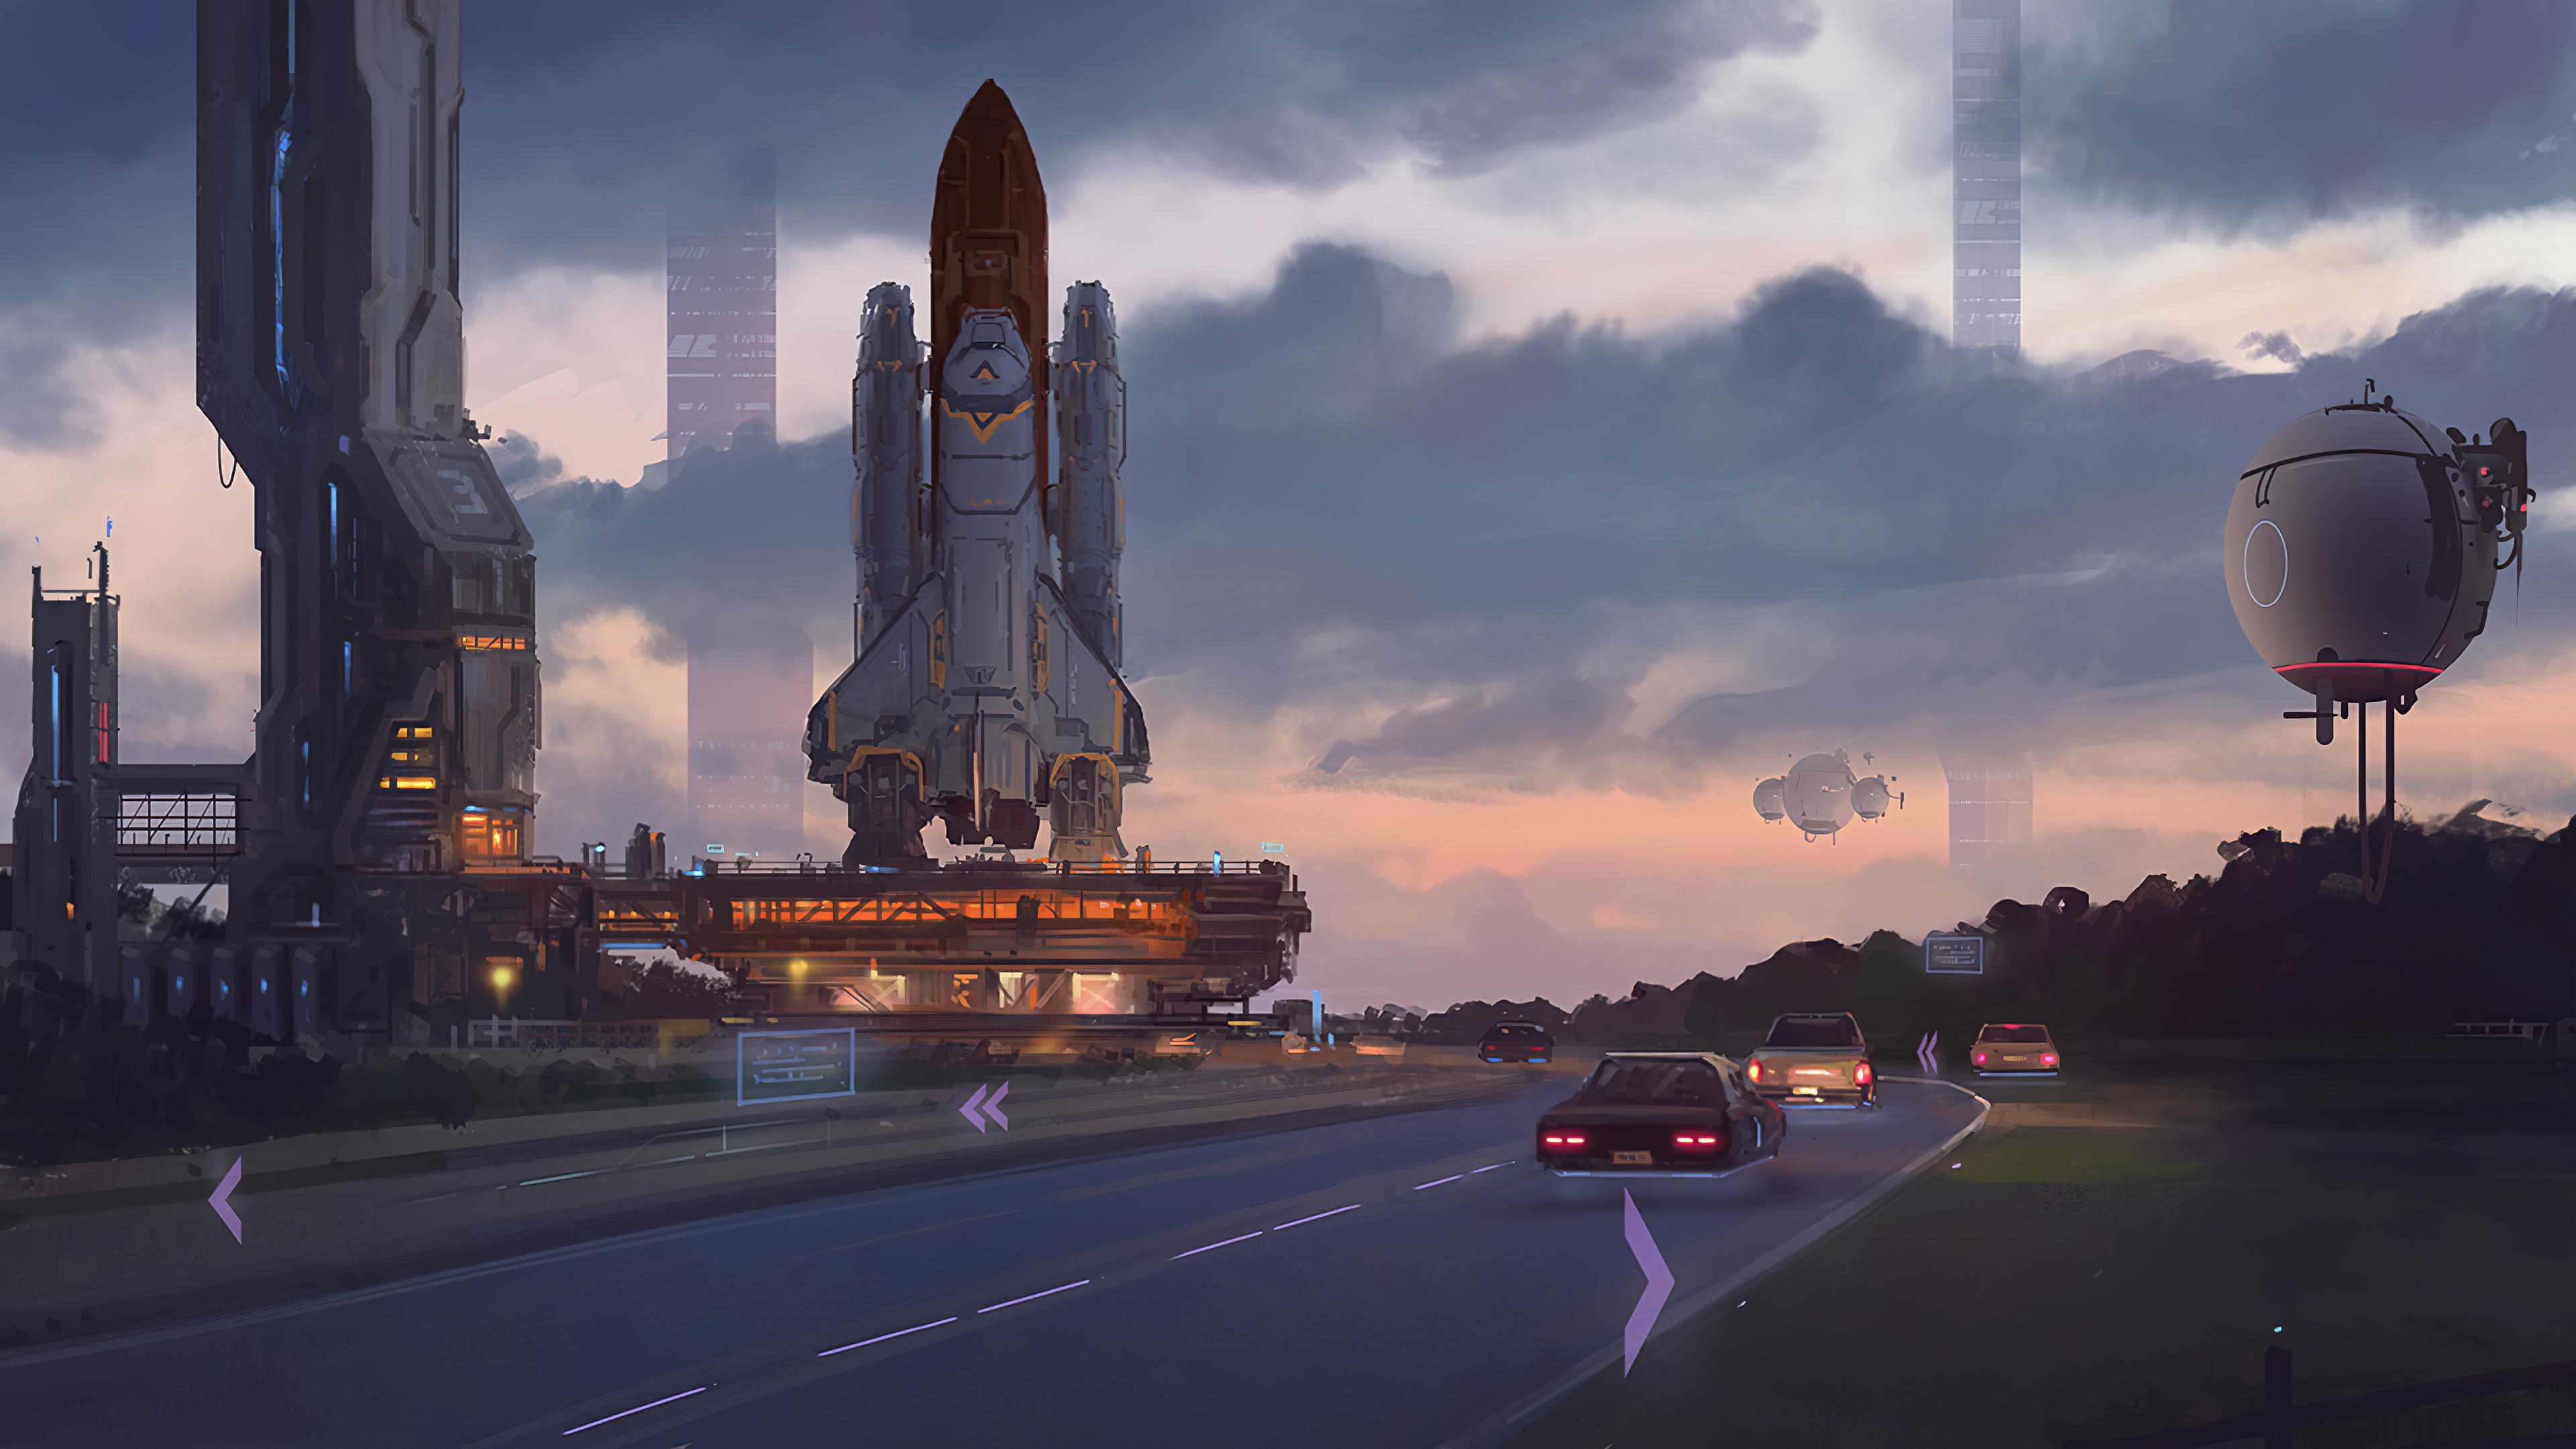 General 3840x2160 digital art fantasy art artwork futuristic road car spaceship wan bao launch pads